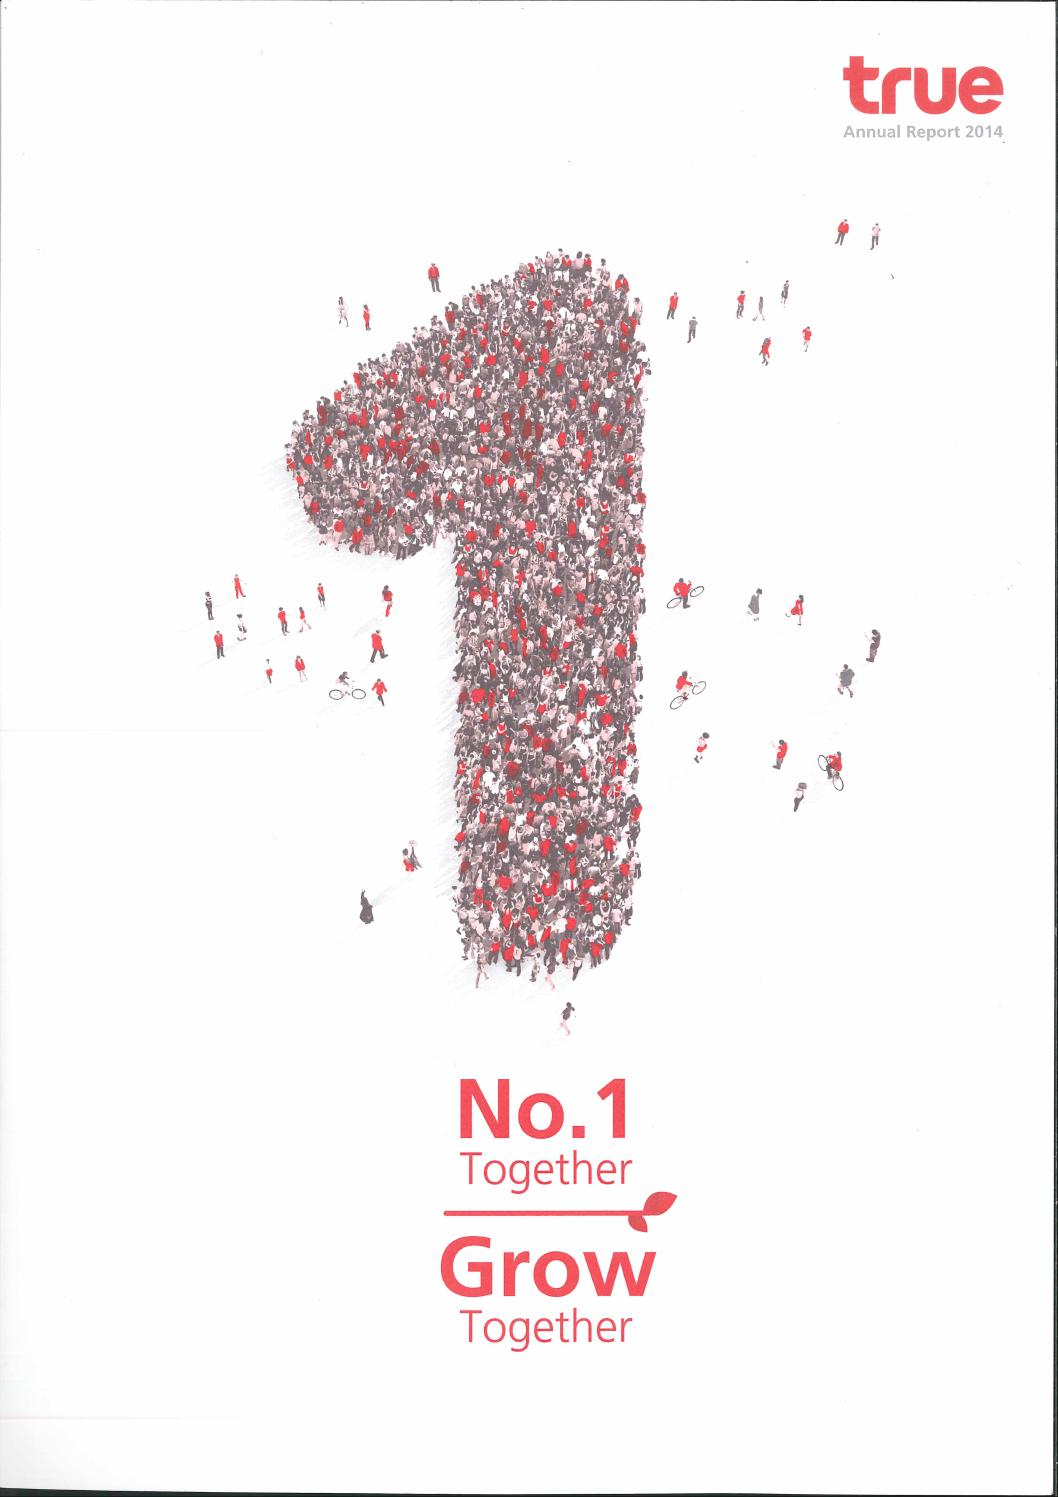 Toyota Financial Statement True Annual Report 2015 By True Corporation Public Company